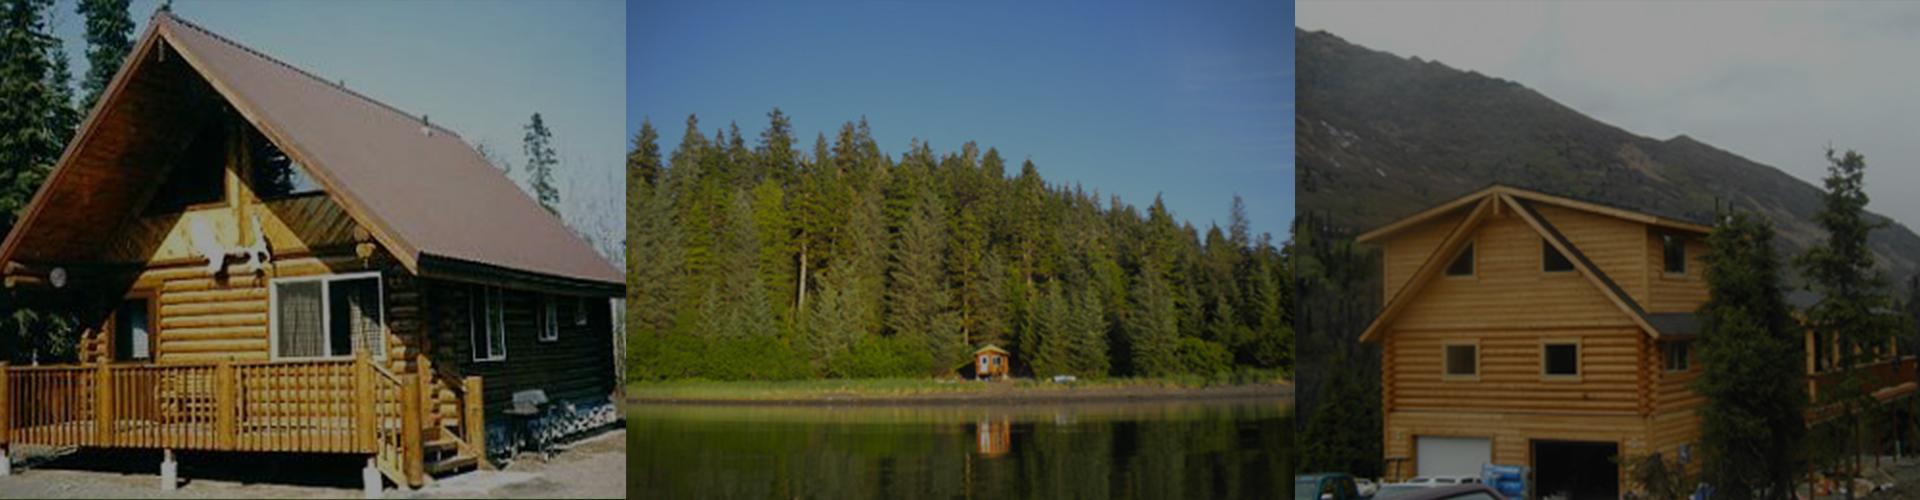 Alaskan Made Superior Logs - Log Homes, Log Kits, Log Cabins, Pre